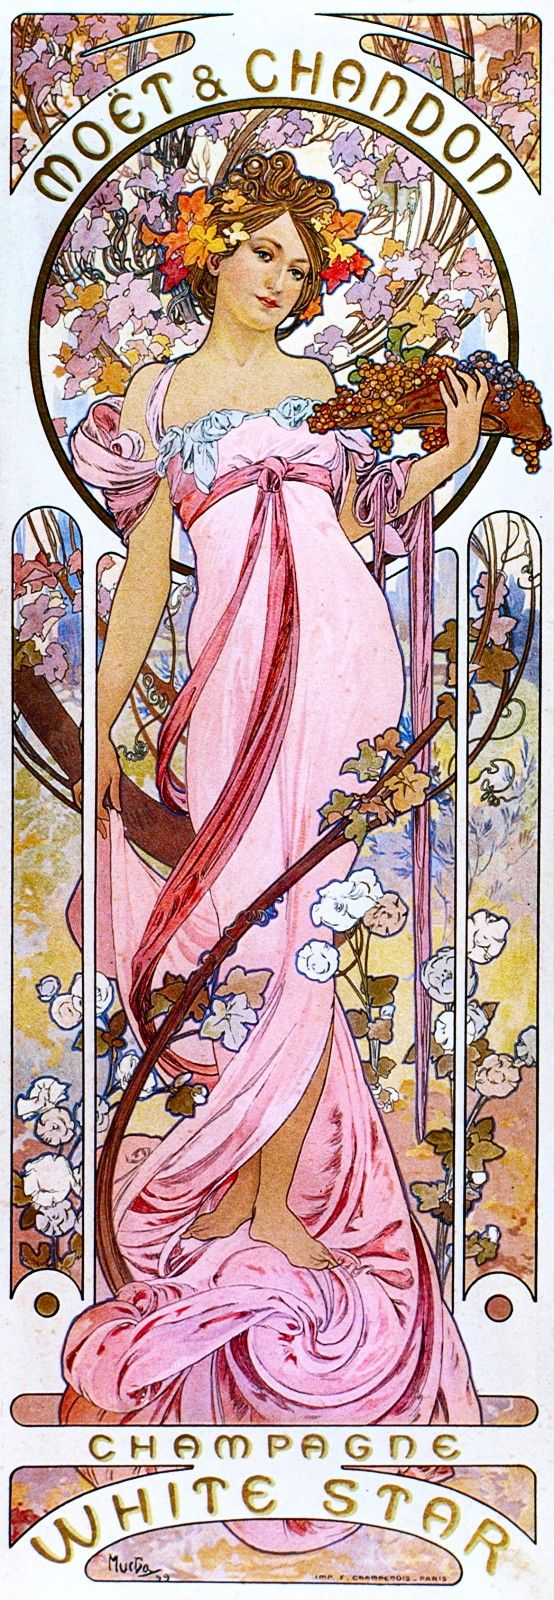 Art Nouveau Mucha Moët & Chandon Champagne - White Star -1899 - by Alphonse Maria Mucha